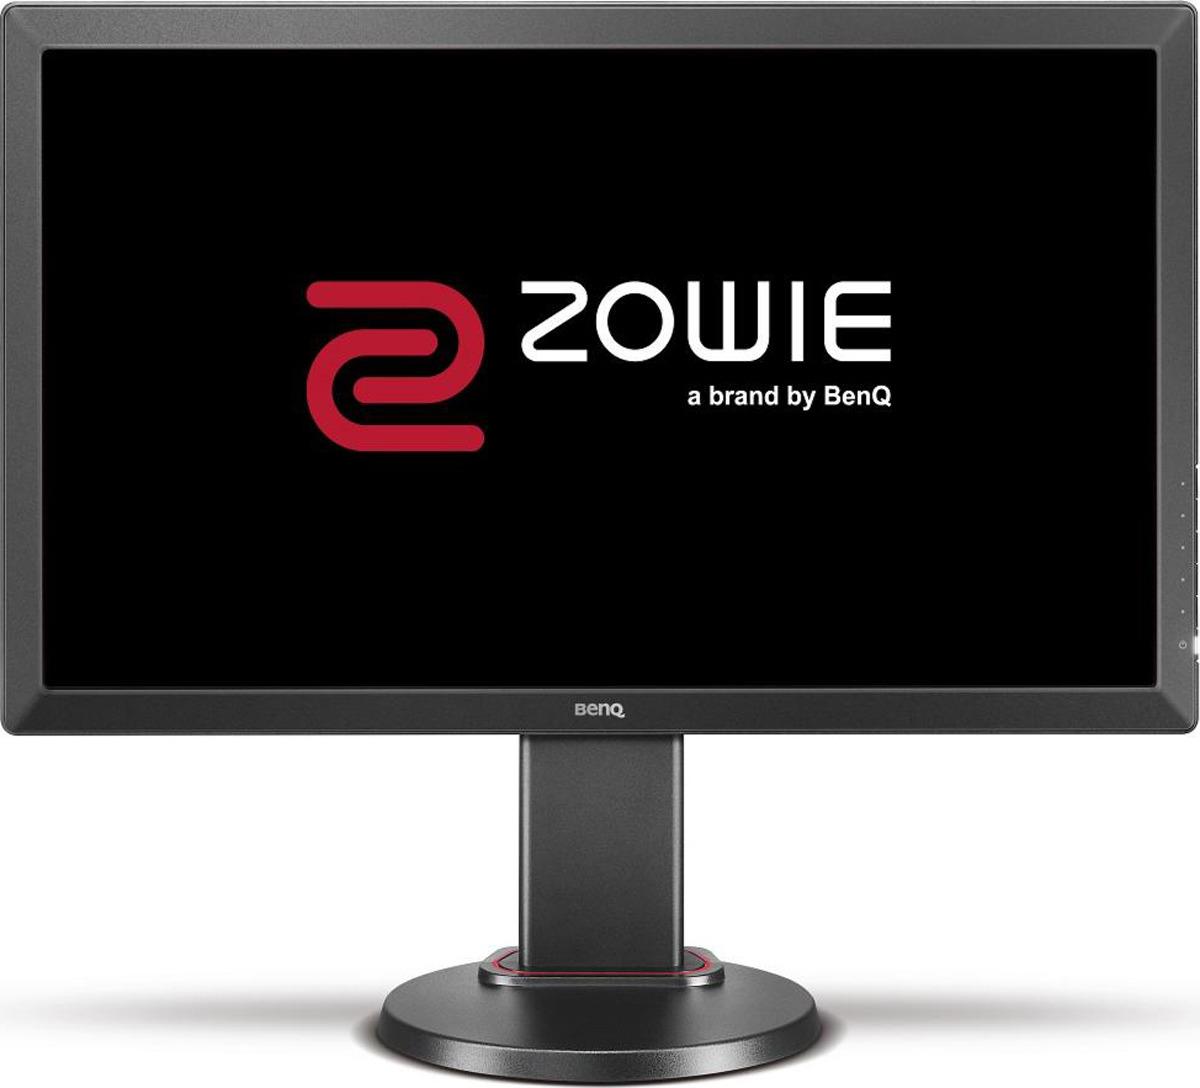 Монитор Benq Zowie RL2455T, 24, 9H.LGRLB.QBE, серый dobe tyx 530 multifunction universal tv mount stand holder for ps4 xbox one wii u more black